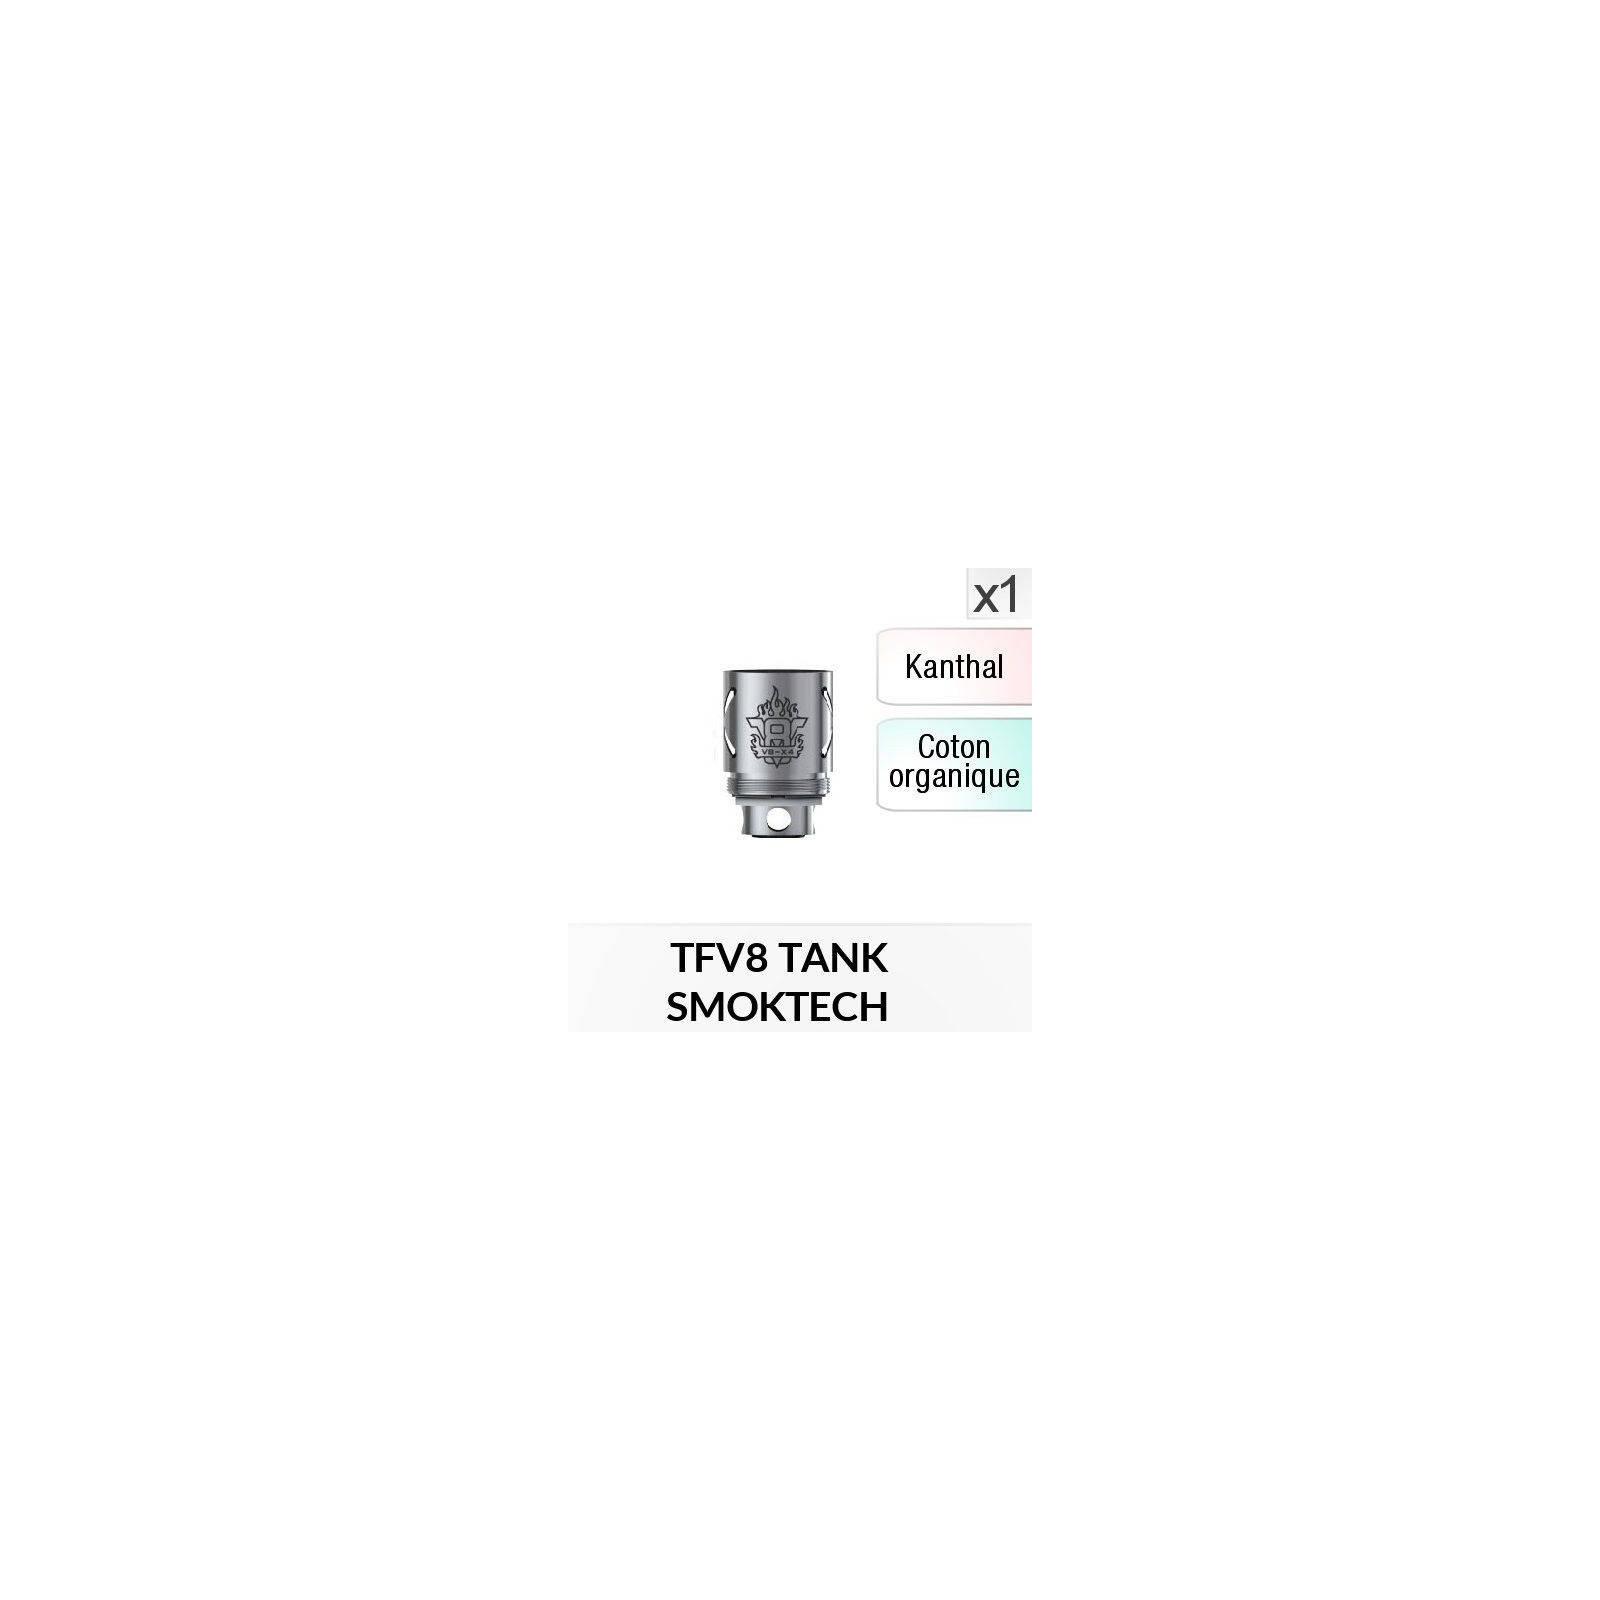 Résistance V8 X4 / 1 Pièce - SMOKTECH